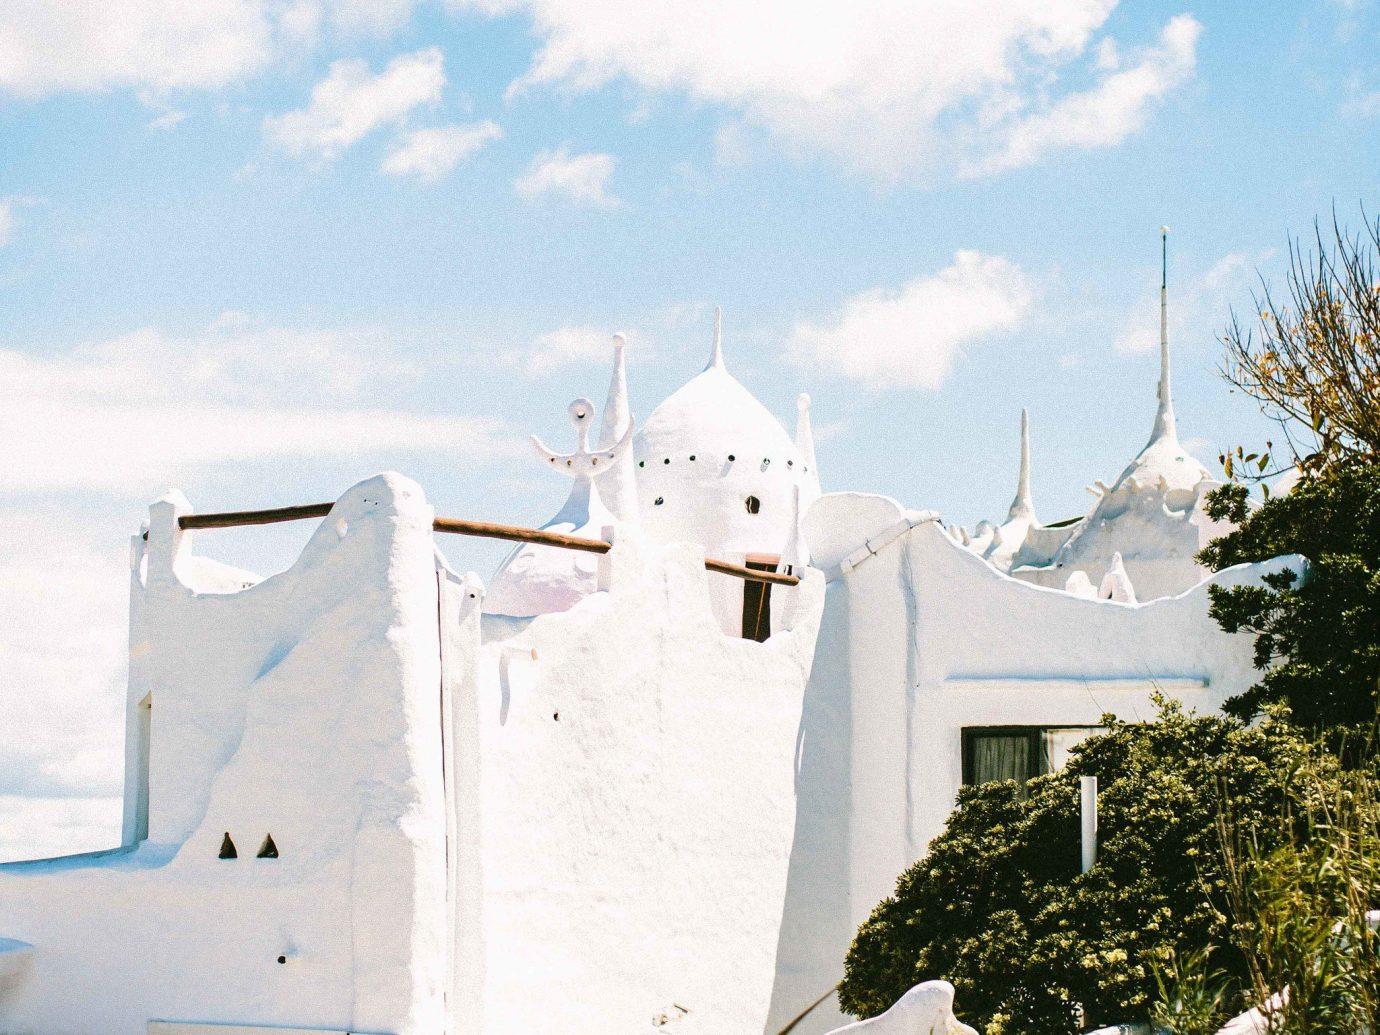 Beach Romantic Getaways south america Trip Ideas Uruguay sky Architecture tree cloud building facade roof tourism